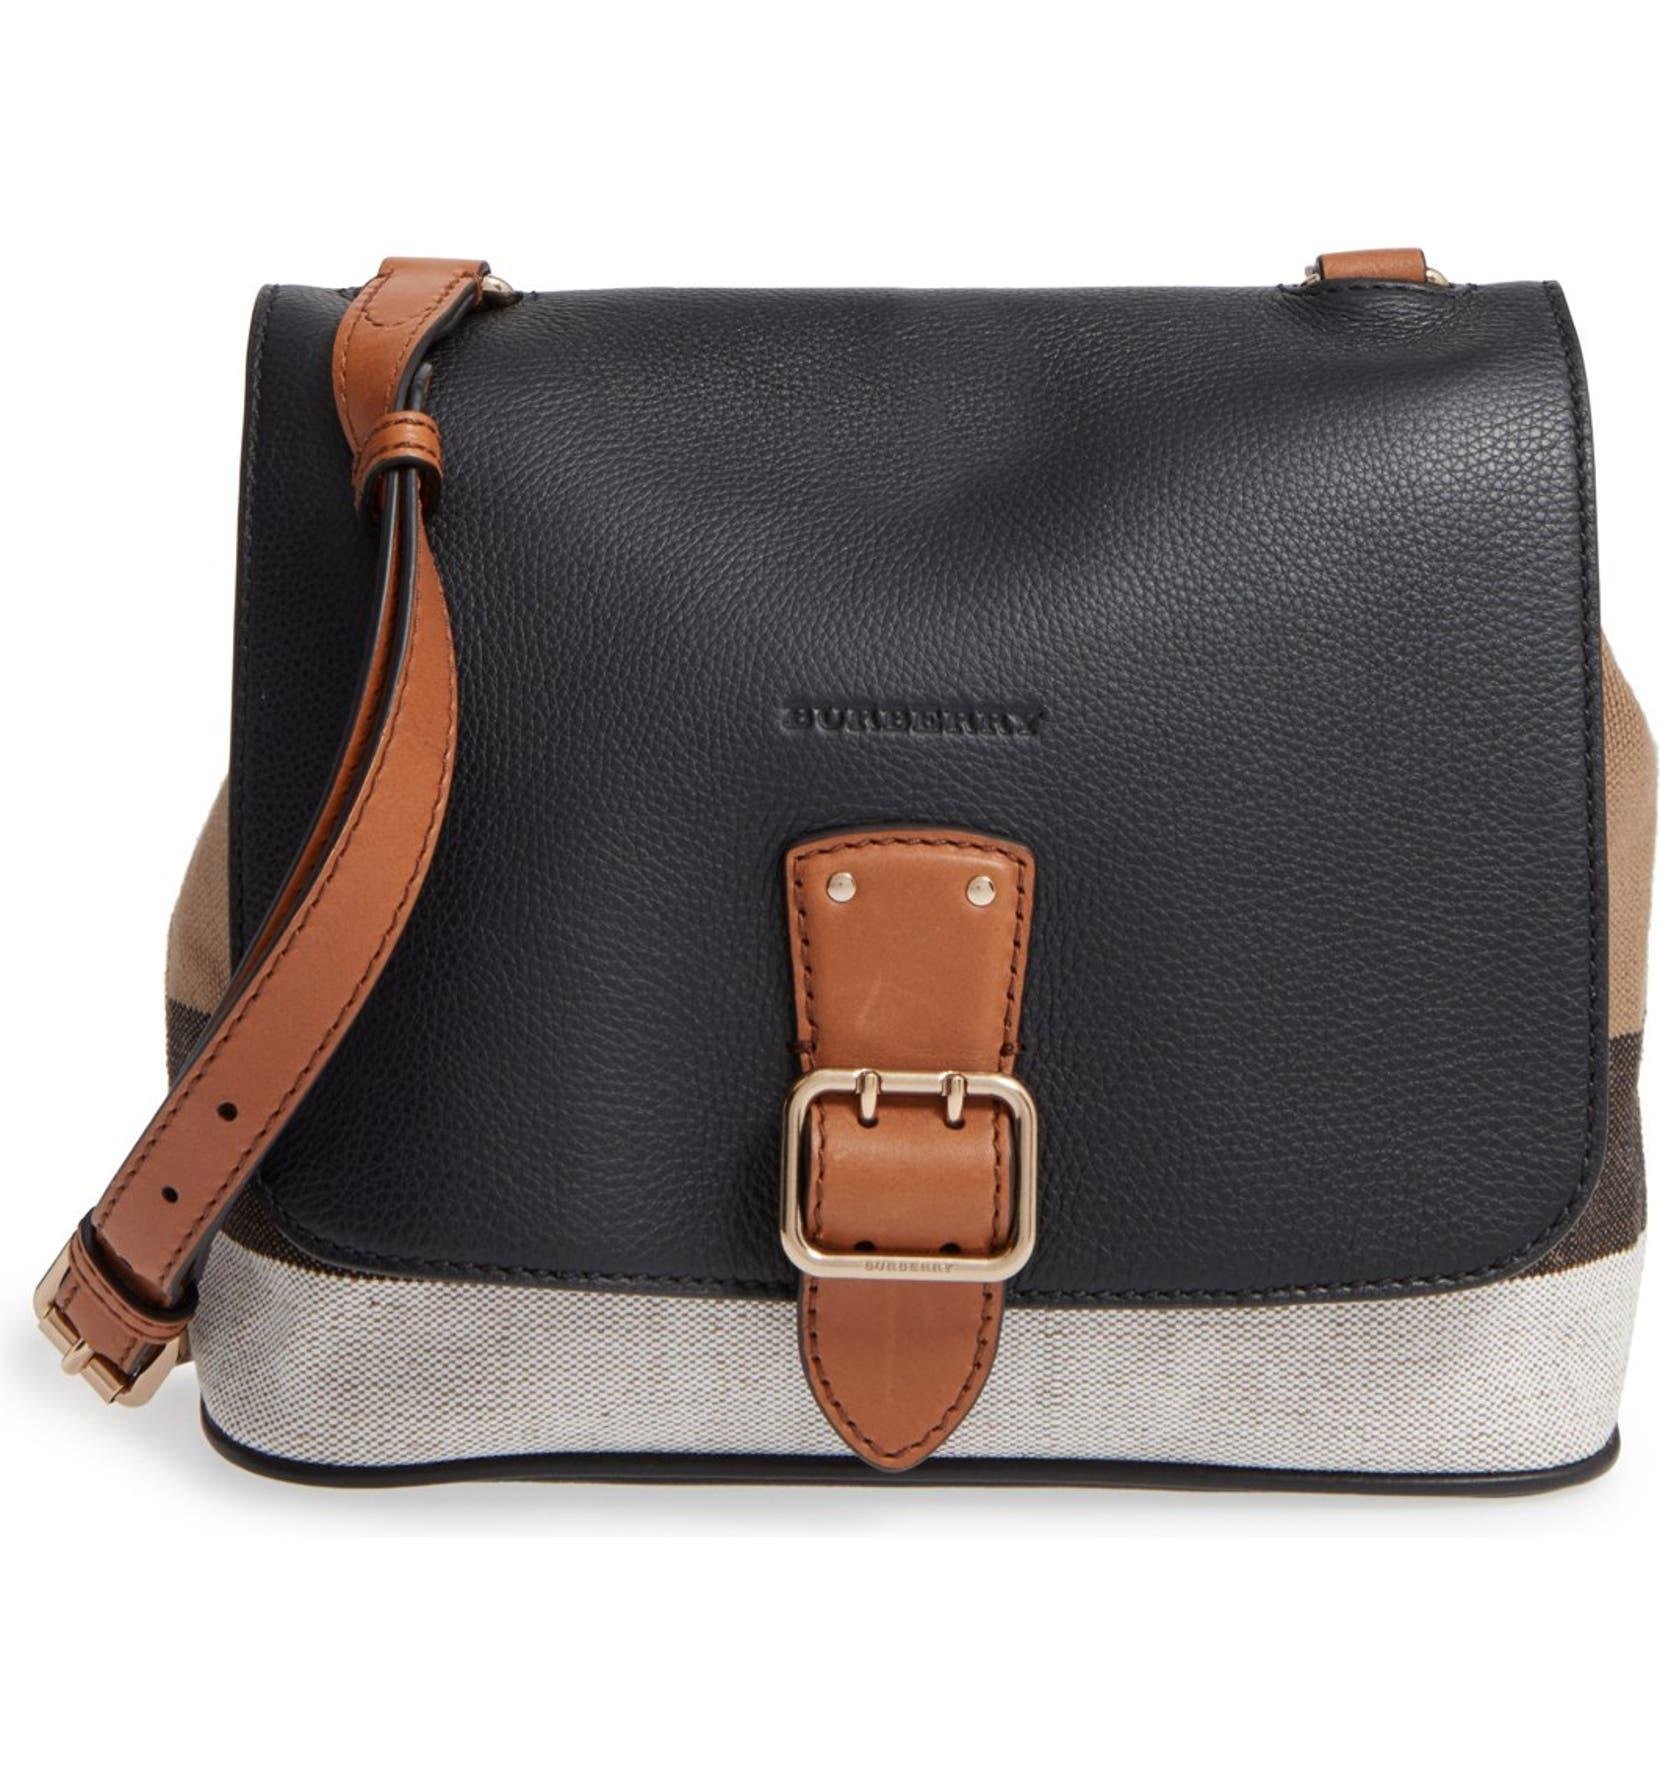 6b851cd15e52 Burberry  Small Shellwood  Canvas   Leather Crossbody Bag